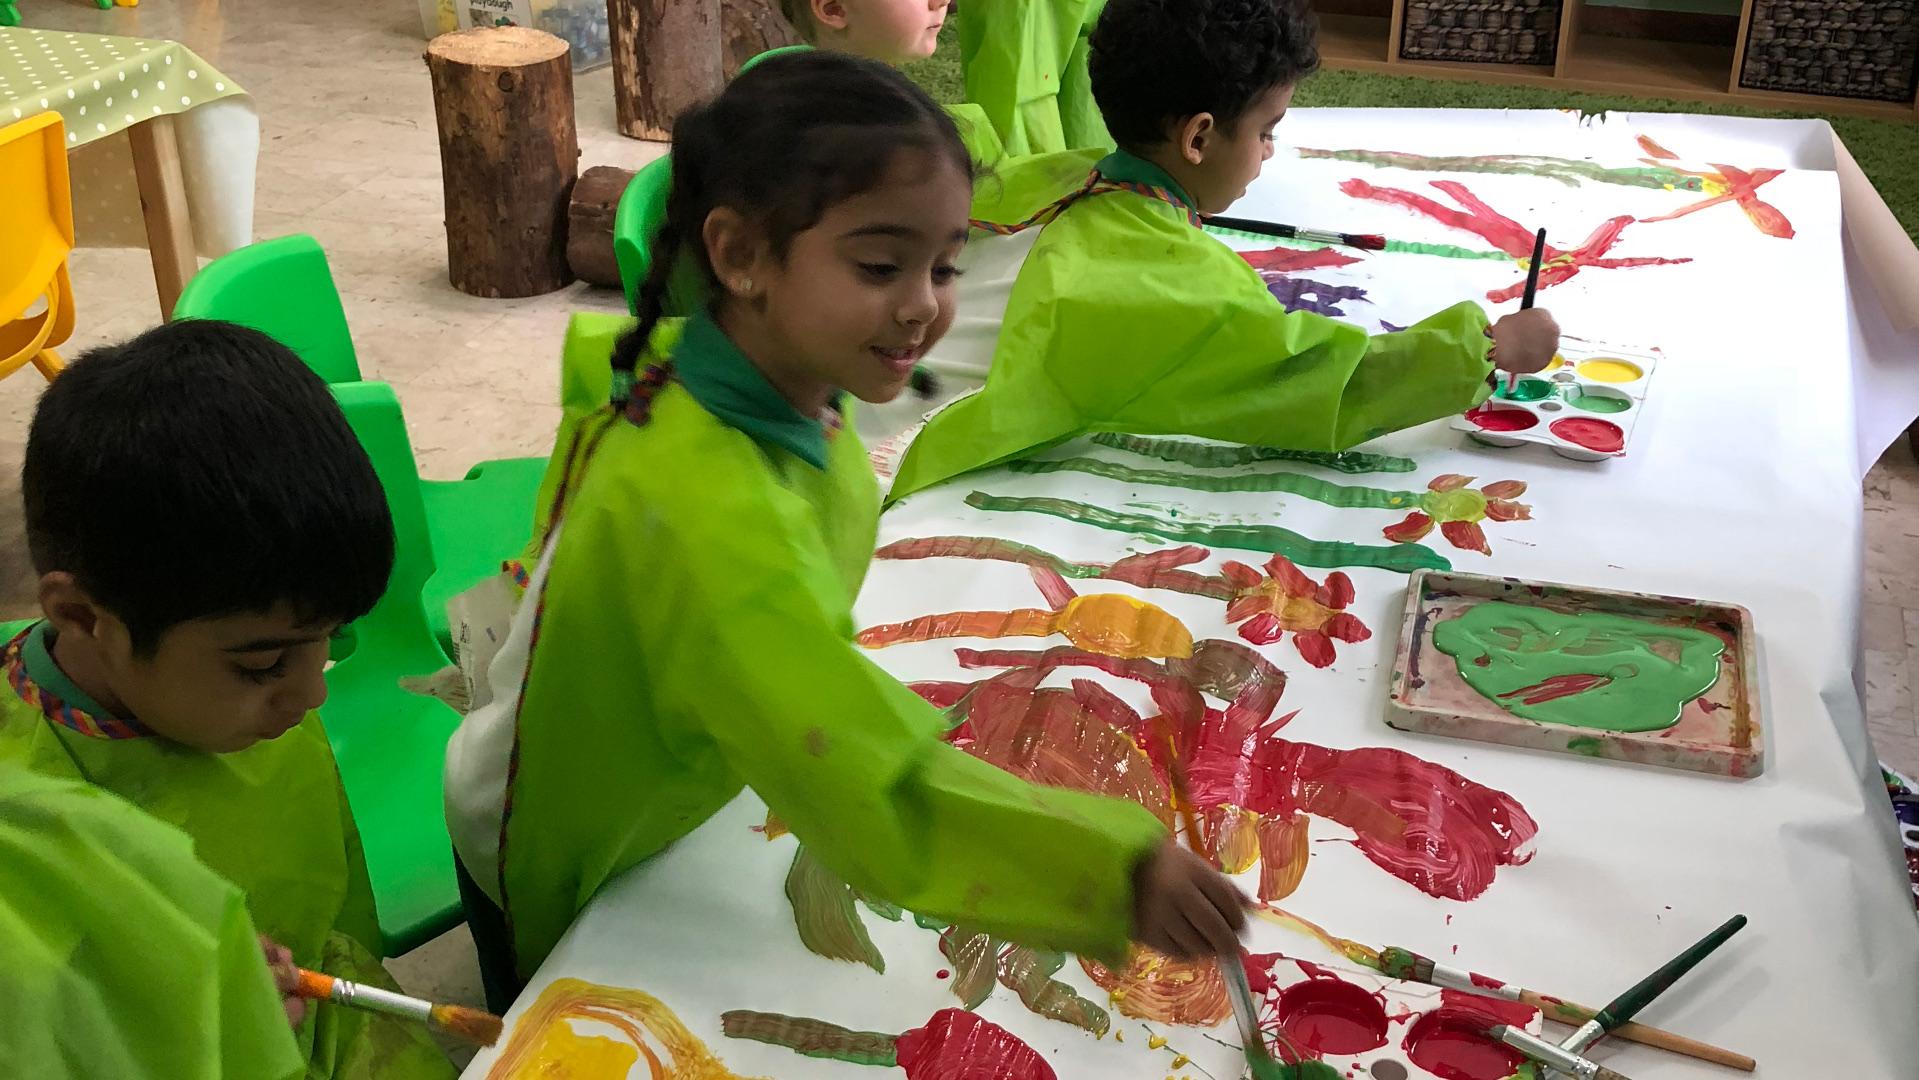 Chapter One Kindergarten Girl Painting